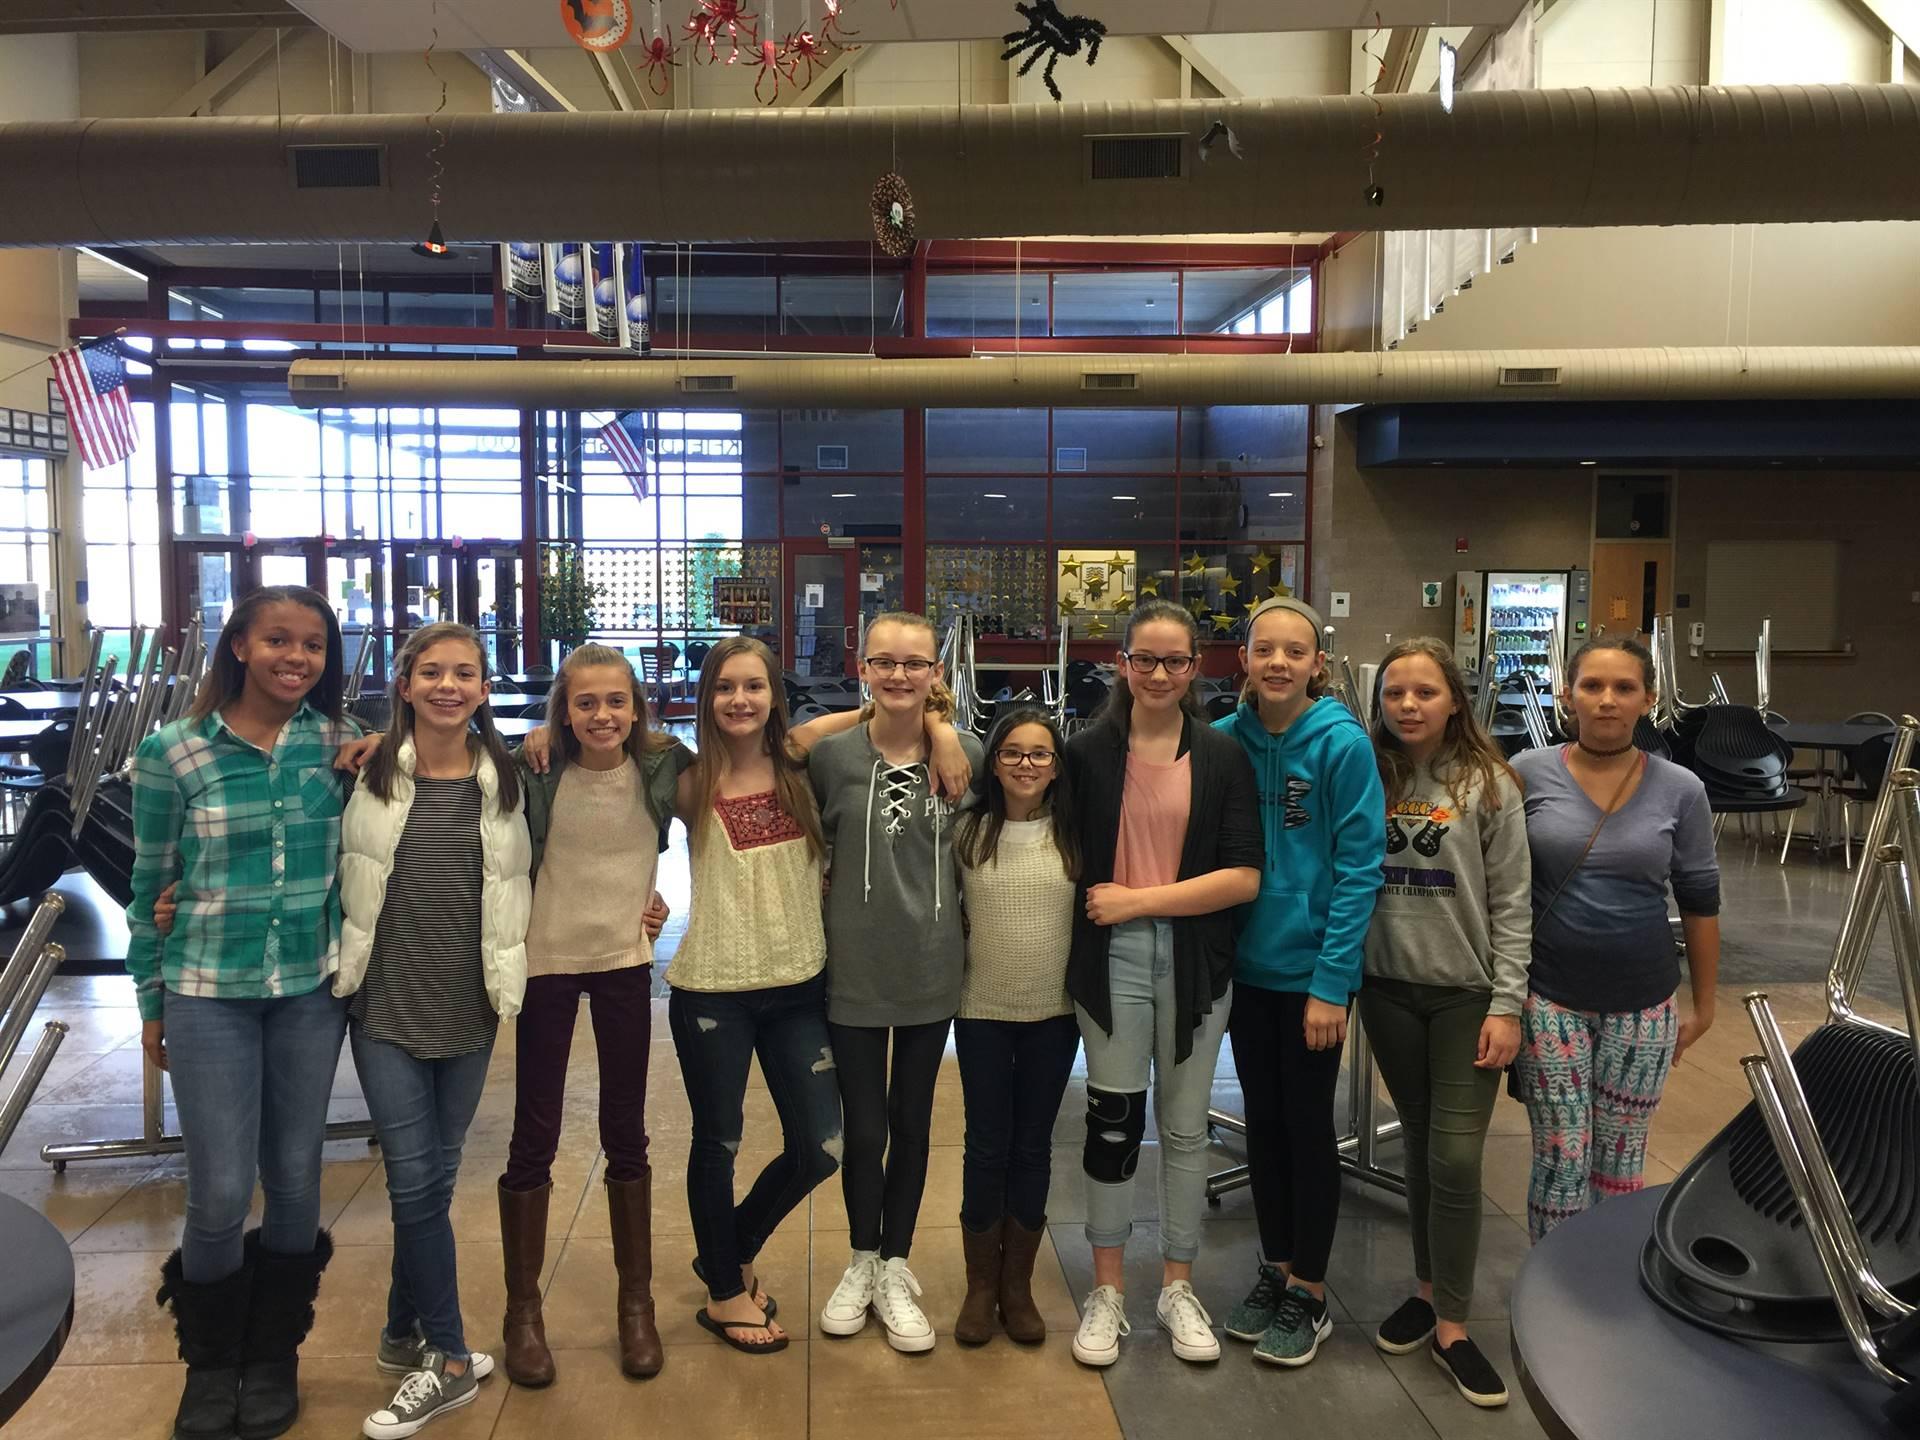 seventh grade cheerleaders